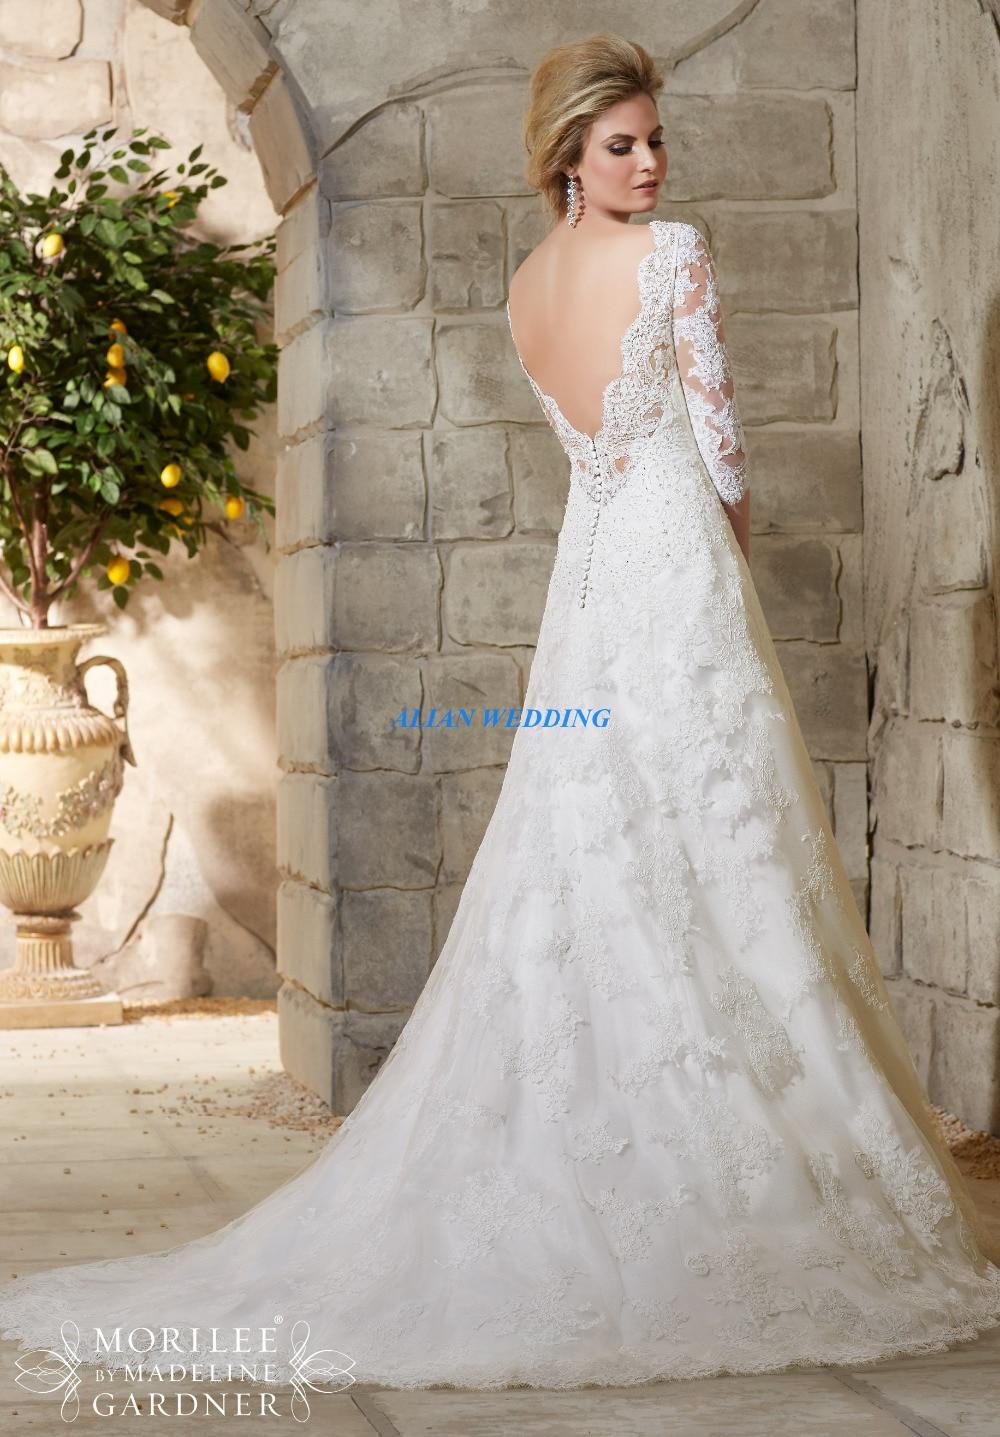 Jordan Wedding Dresses 3/4 Sleeve Mermaid Vestido De Casamento High ...